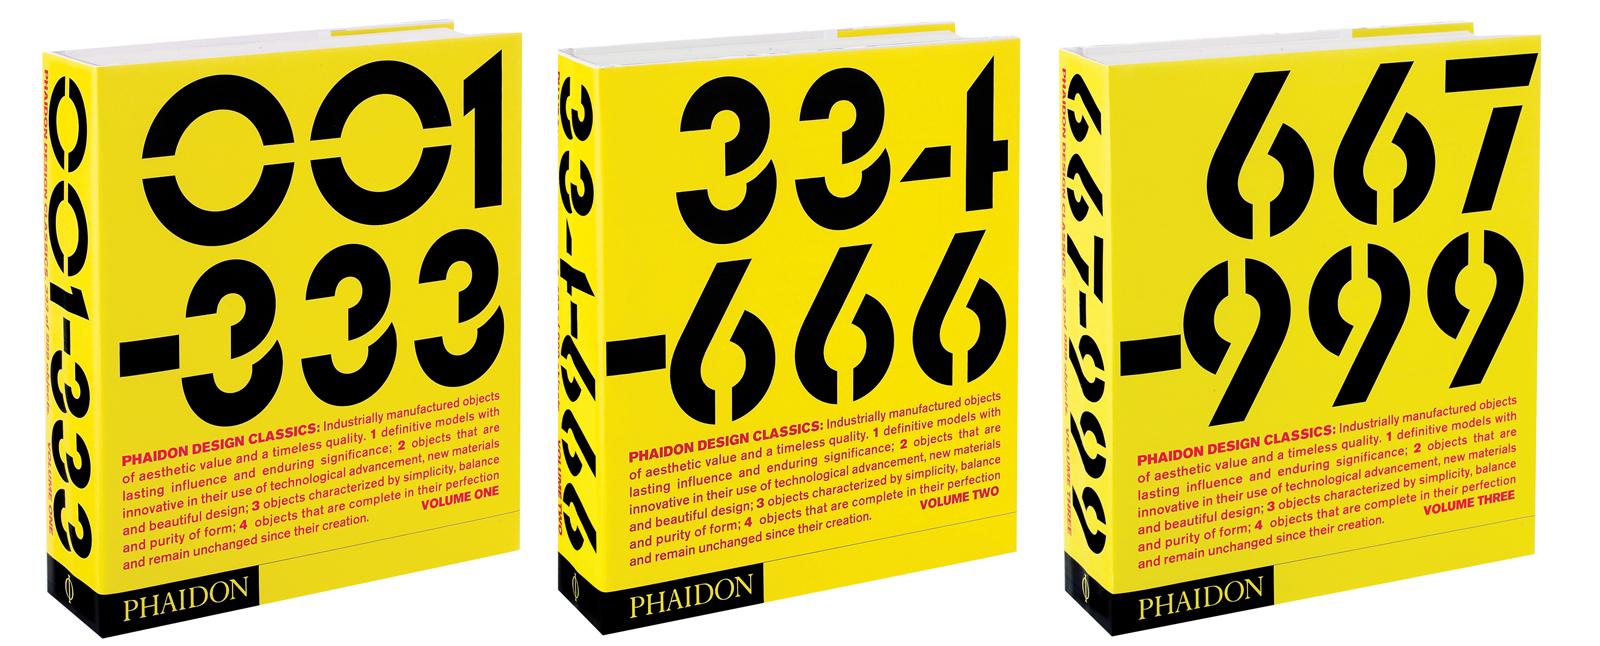 books product design art